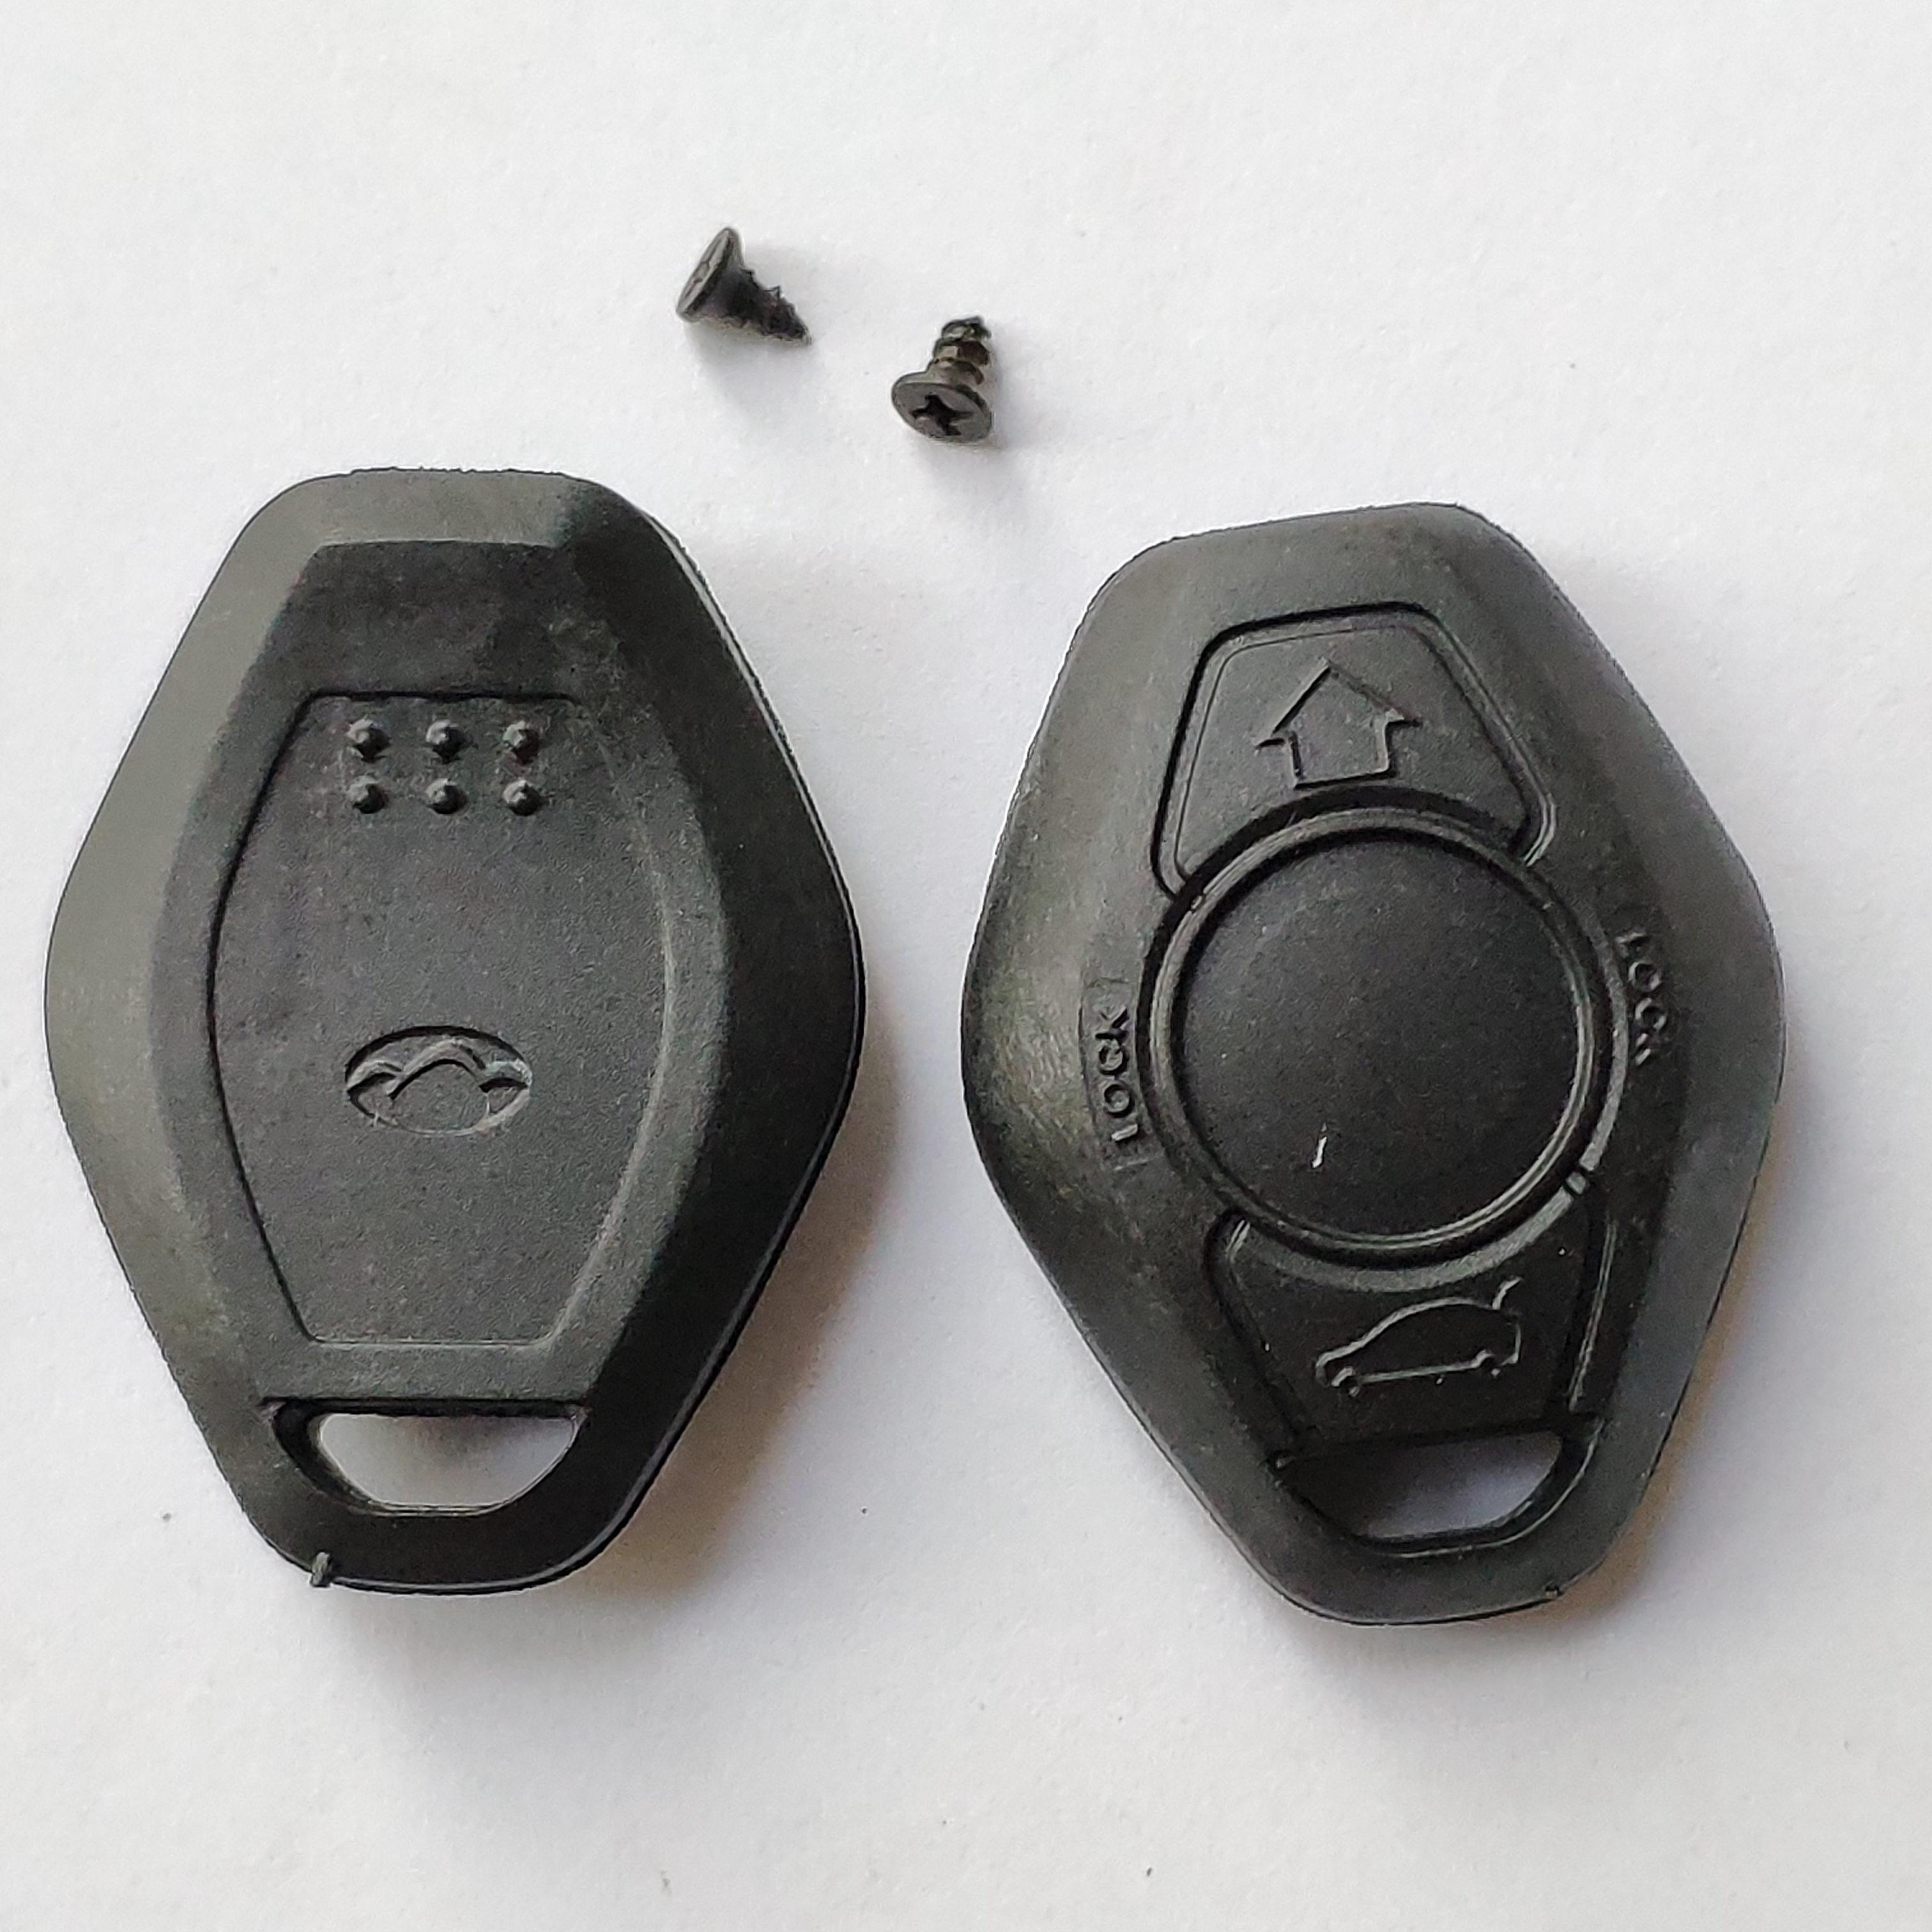 Universal Key Shells Type 7 - 5 pcs/lot